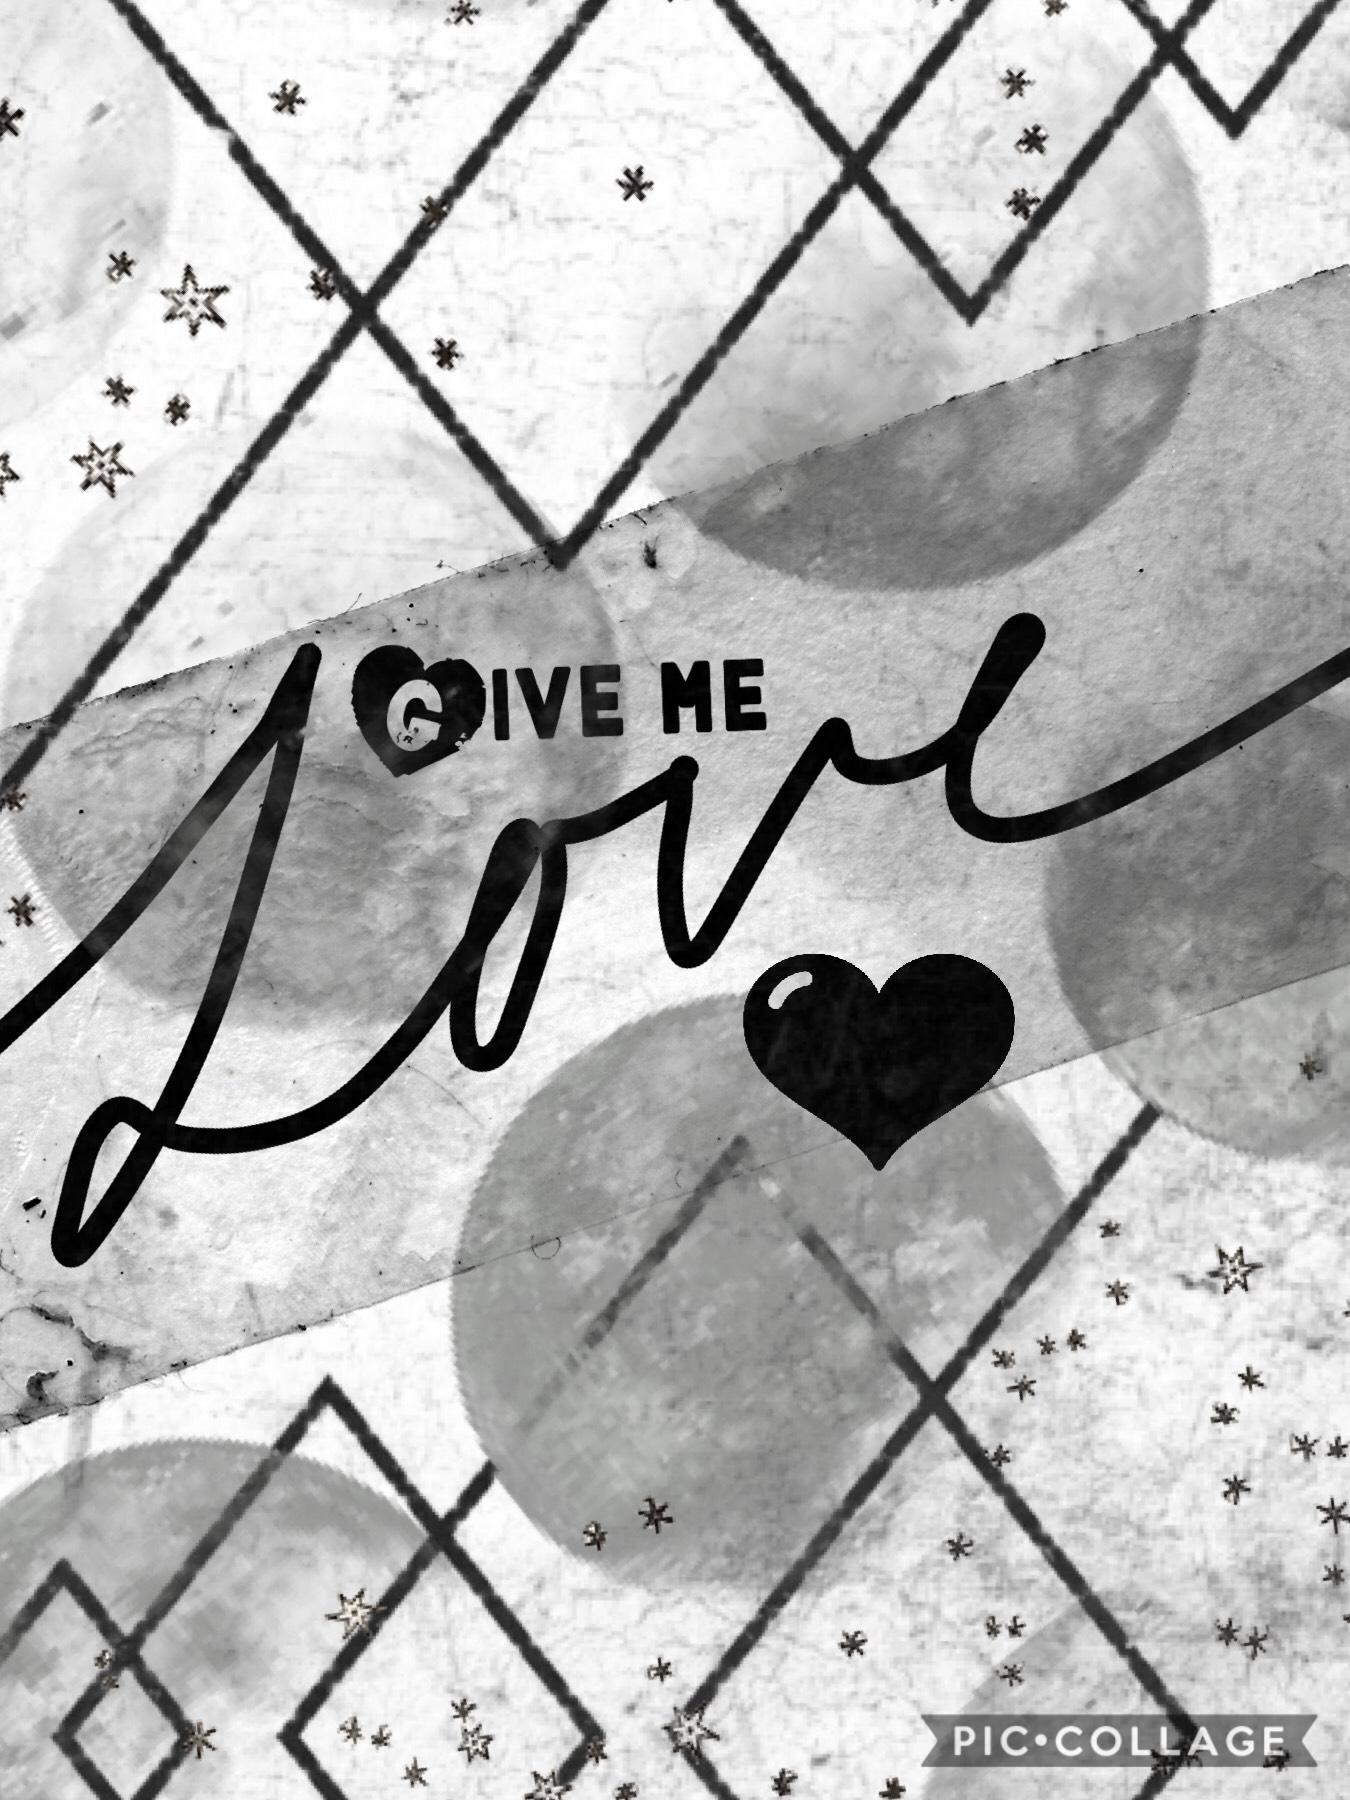 Give me love - Ed Sheeran 🖤